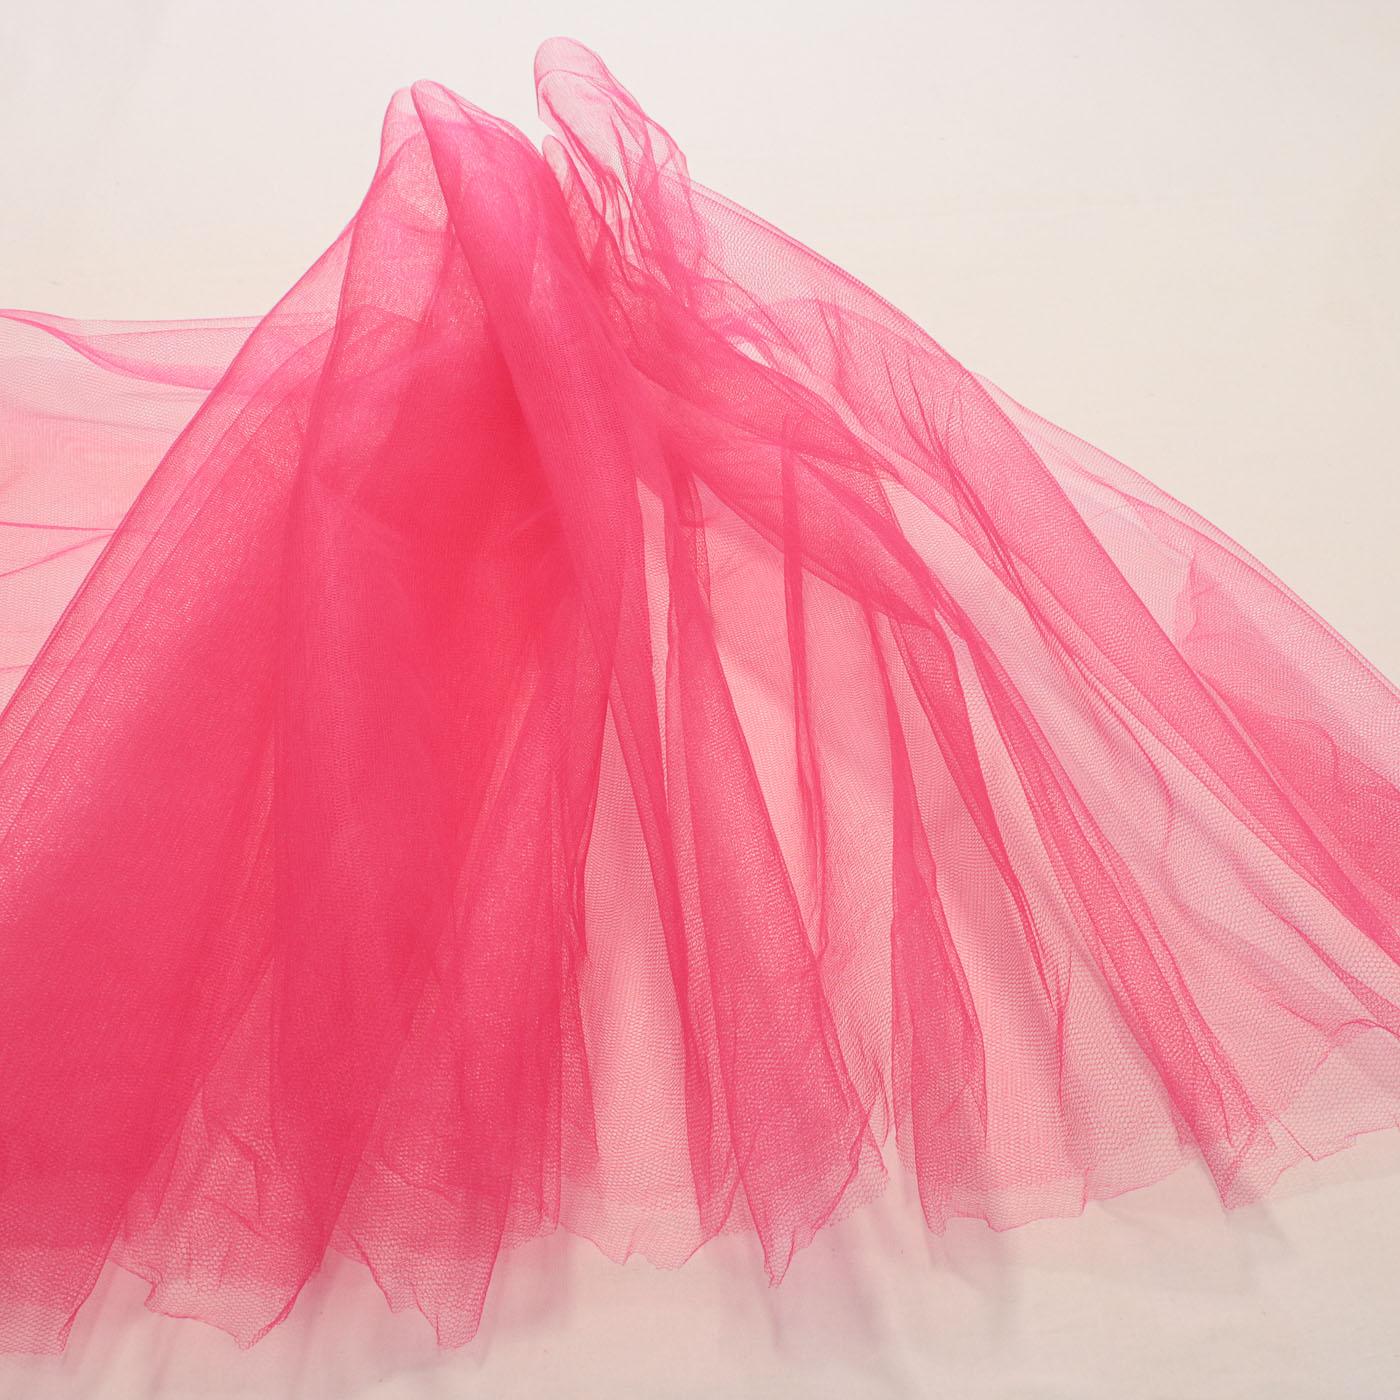 Tecido Tule 100% Poliester 1,20 Mt Largura 016 Rosa Pink